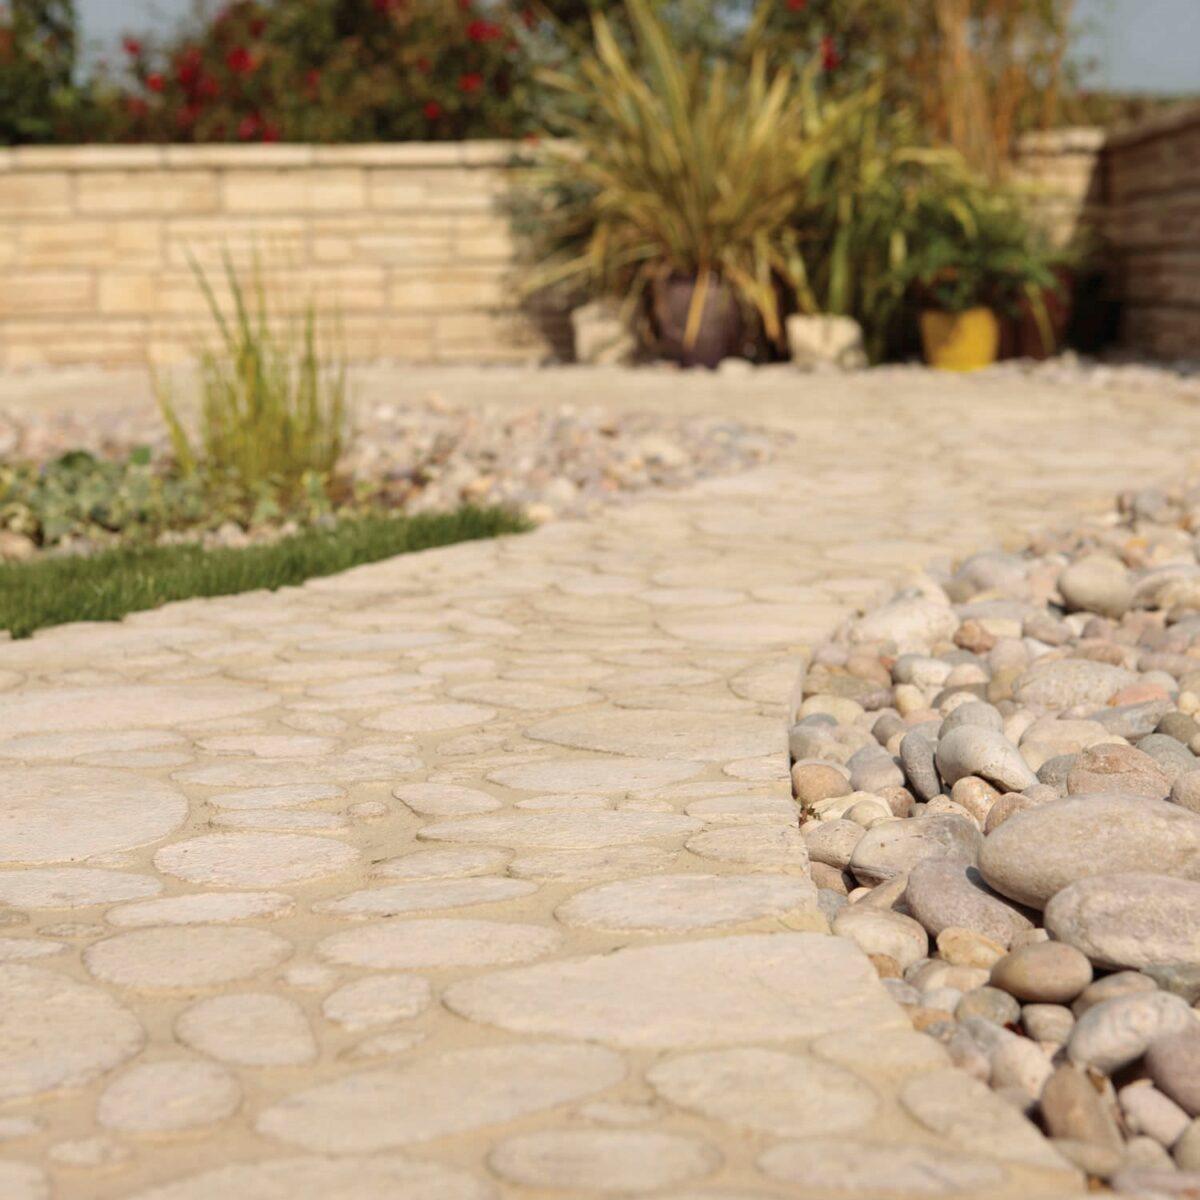 pavimentazione-giardino-idee-stili-esempi-5